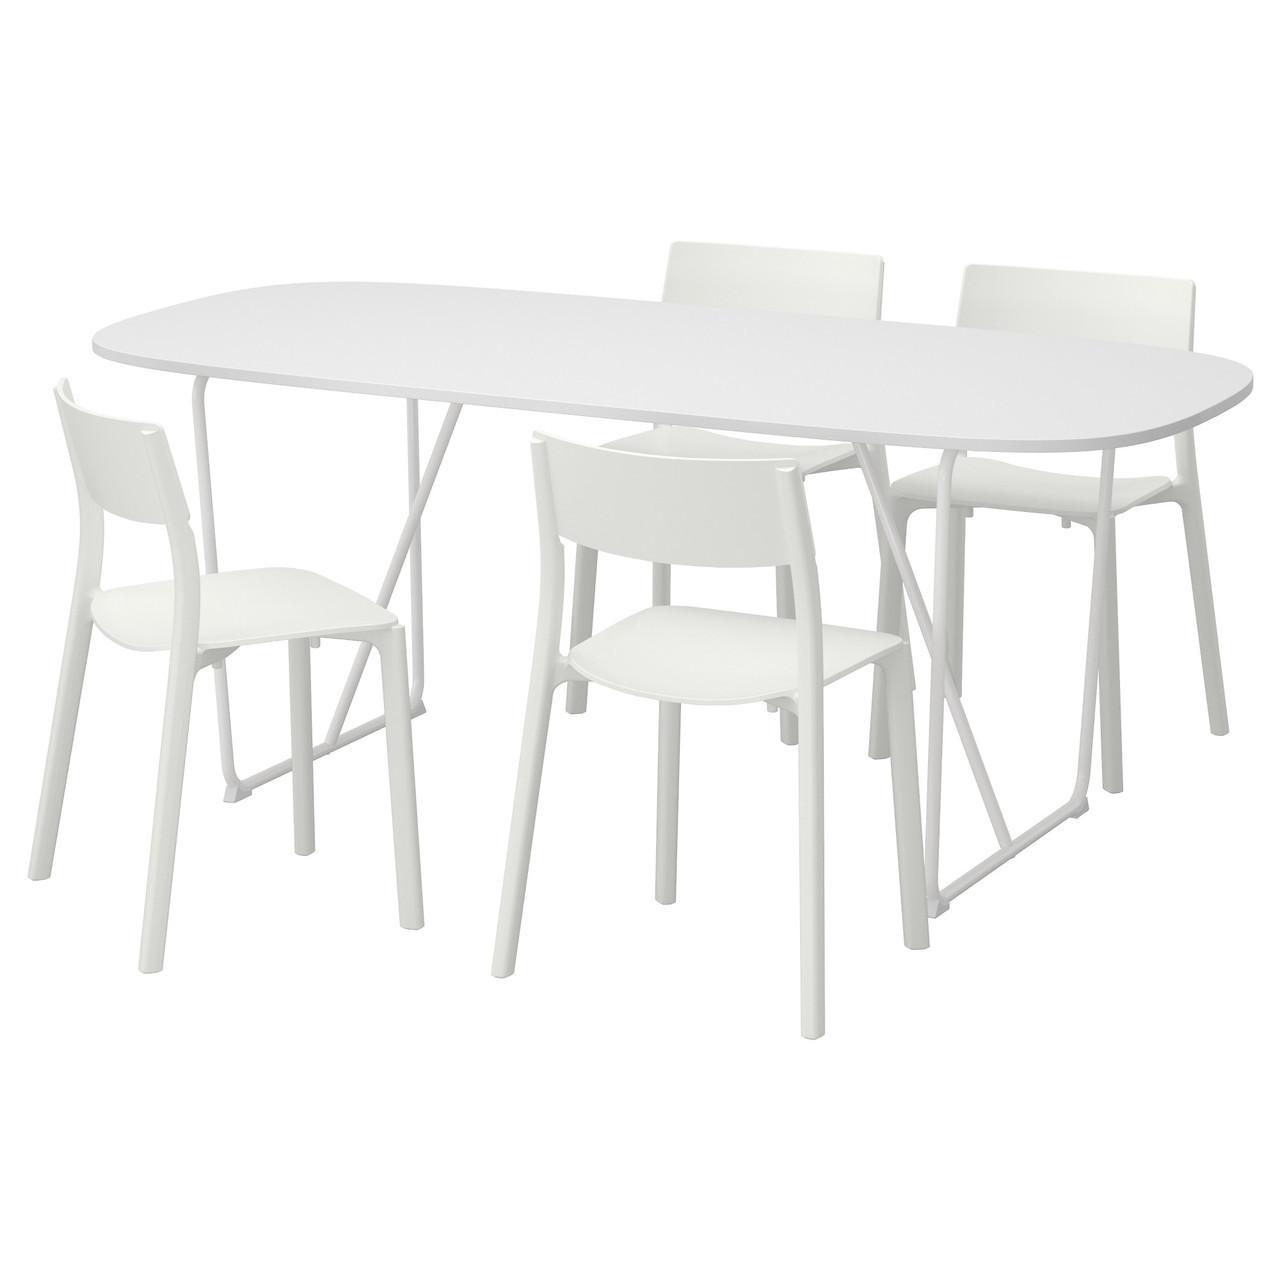 OPPEBY/ BACKARYD / JANINGE Стол и 4 стула, белый, белый 391.615.44